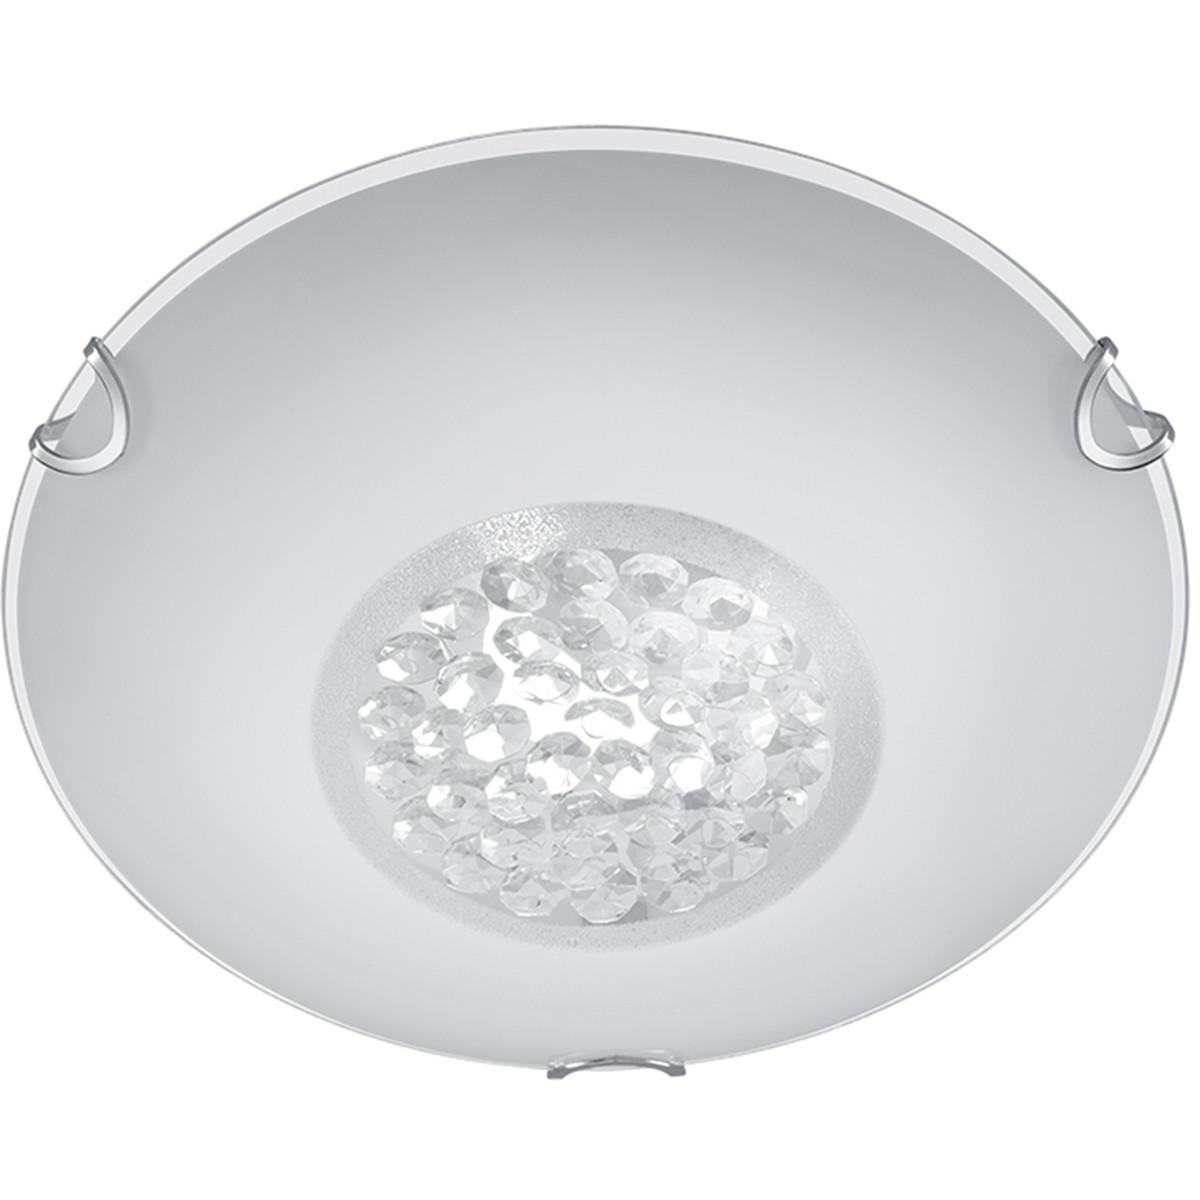 LED Plafondlamp - Plafondverlichting - Trion Cornio - E27 Fitting - 1-lichts - Rond - Mat Chroom - A